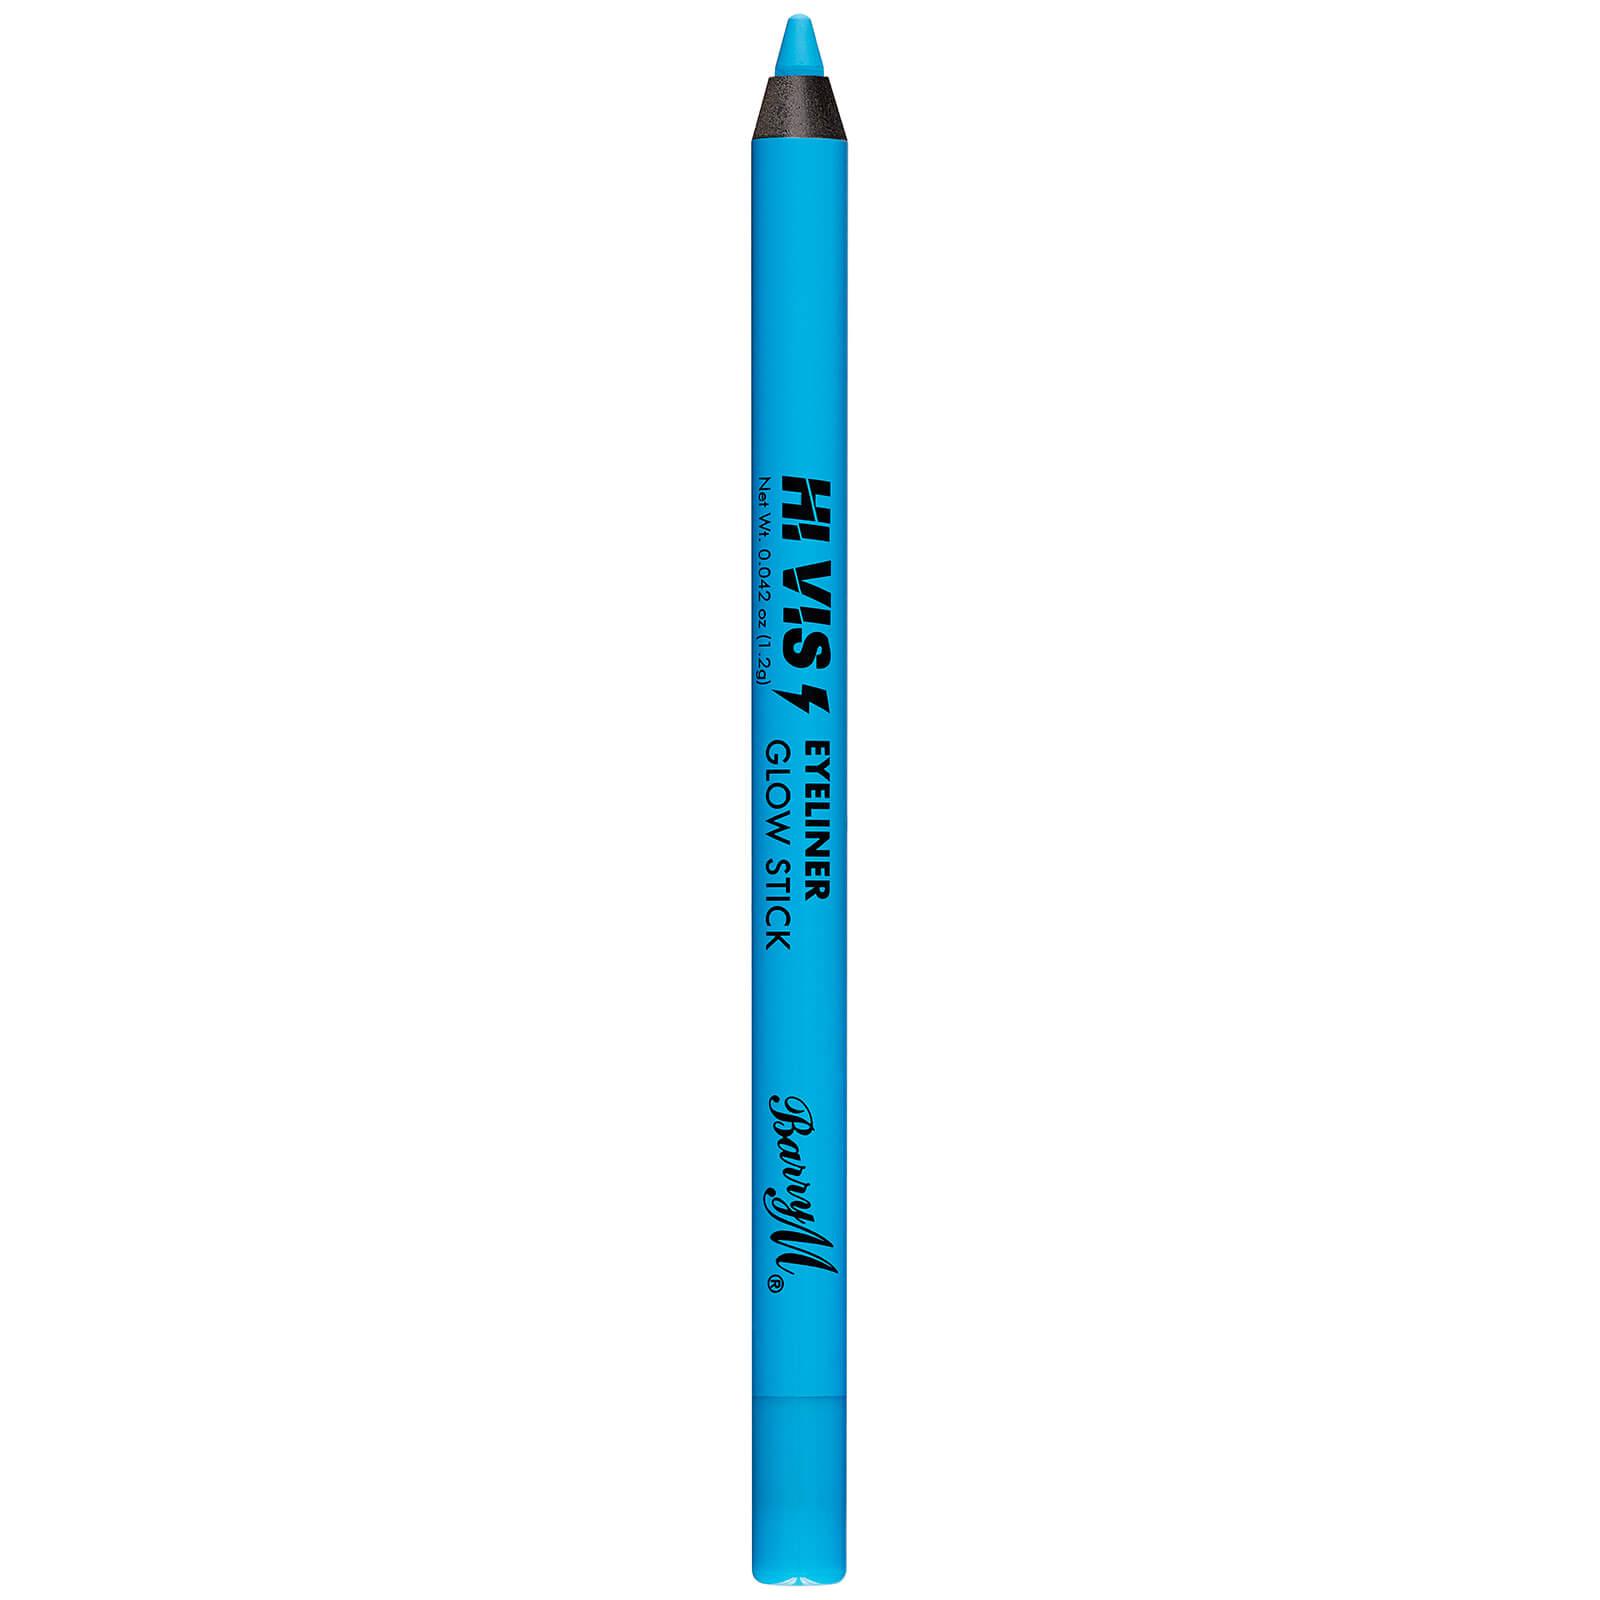 Barry M Cosmetics Hi Vis Bold Waterproof Eyeliner 1.2g (Various Shades) - Glow Stick